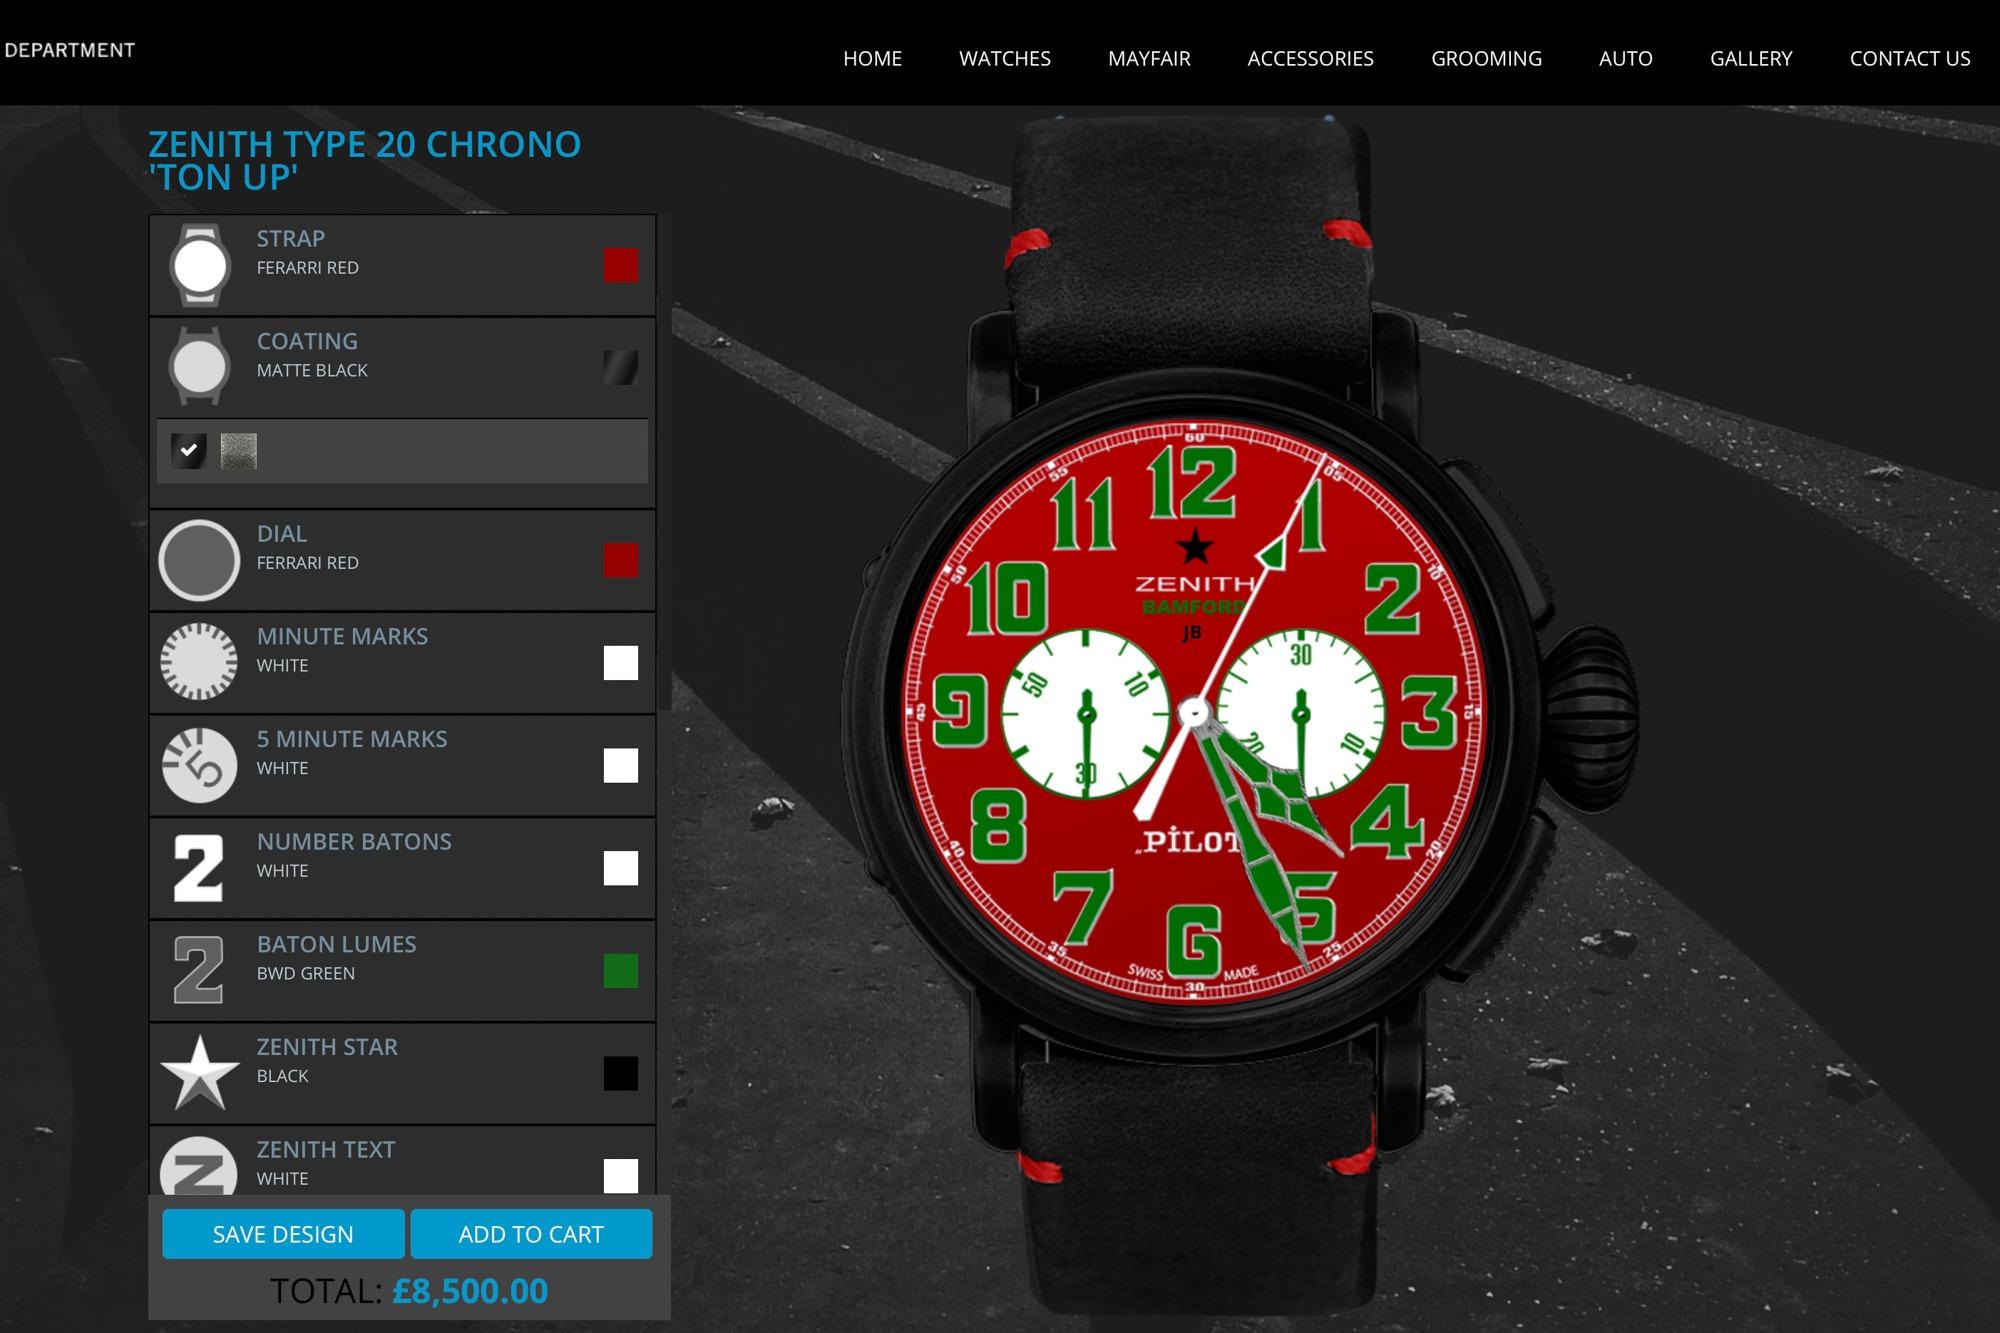 Zenith Pilot - Bamford - Personnalisation de montres BWD